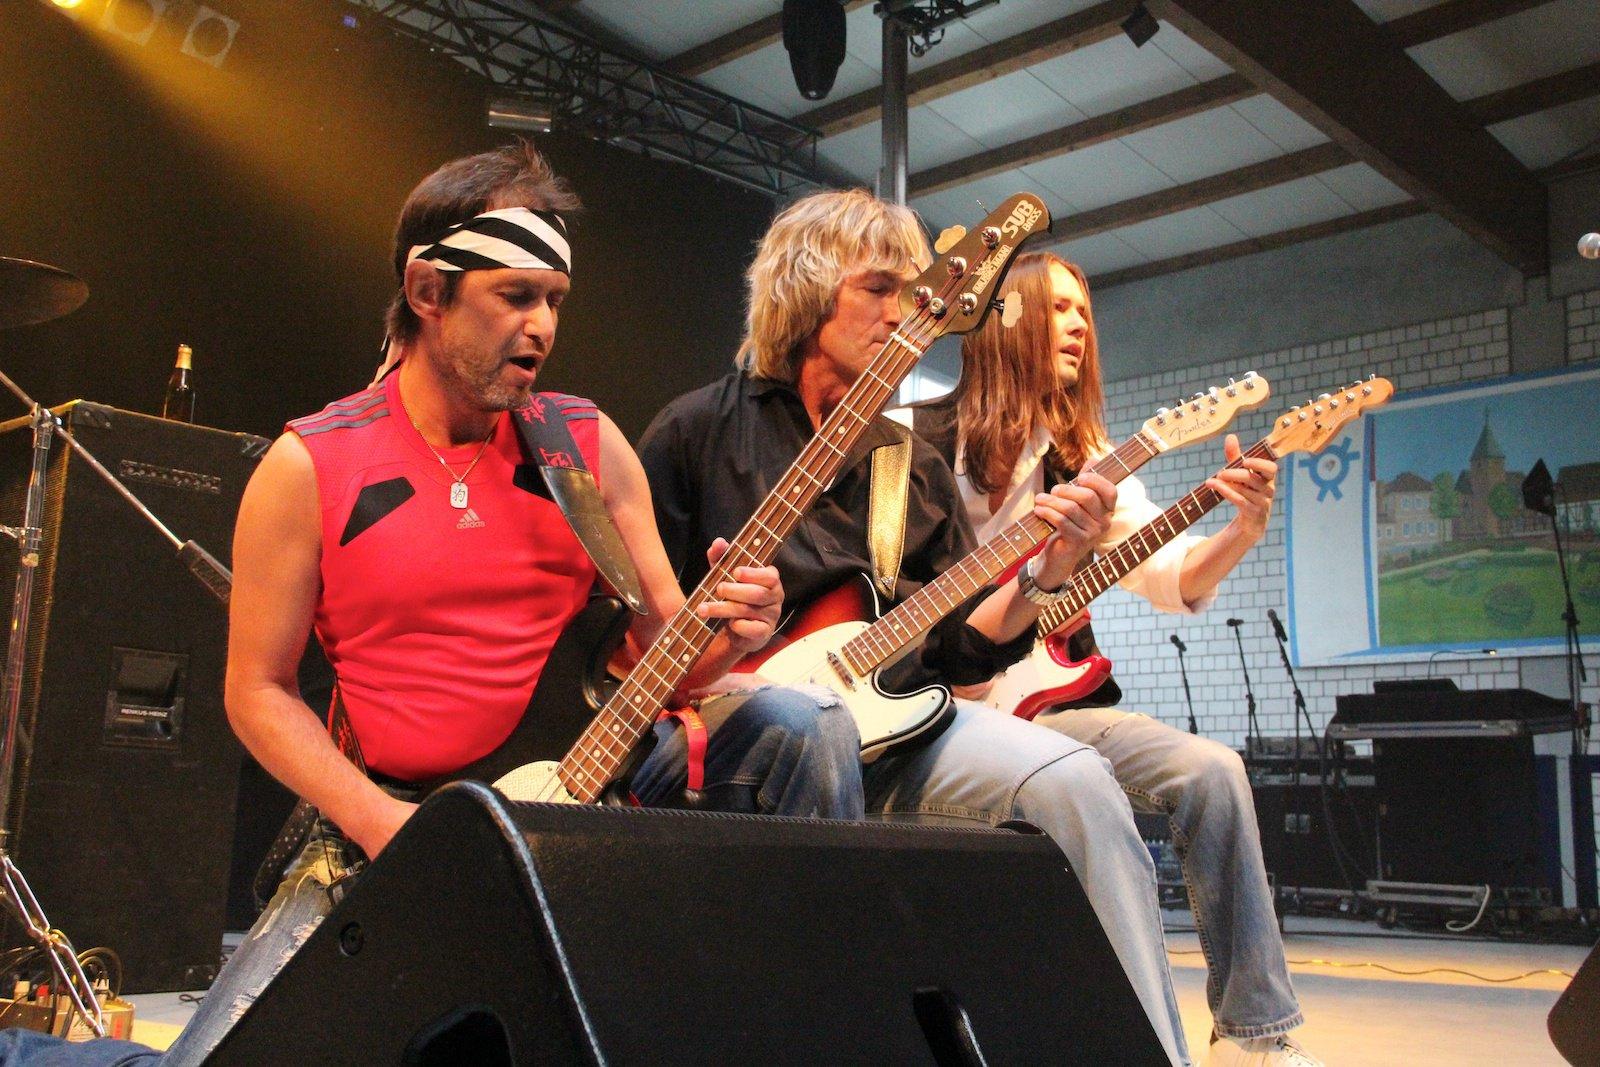 Stainless Quo - Sommerfesthalle, Otterstadt 18.06.2011 - 03